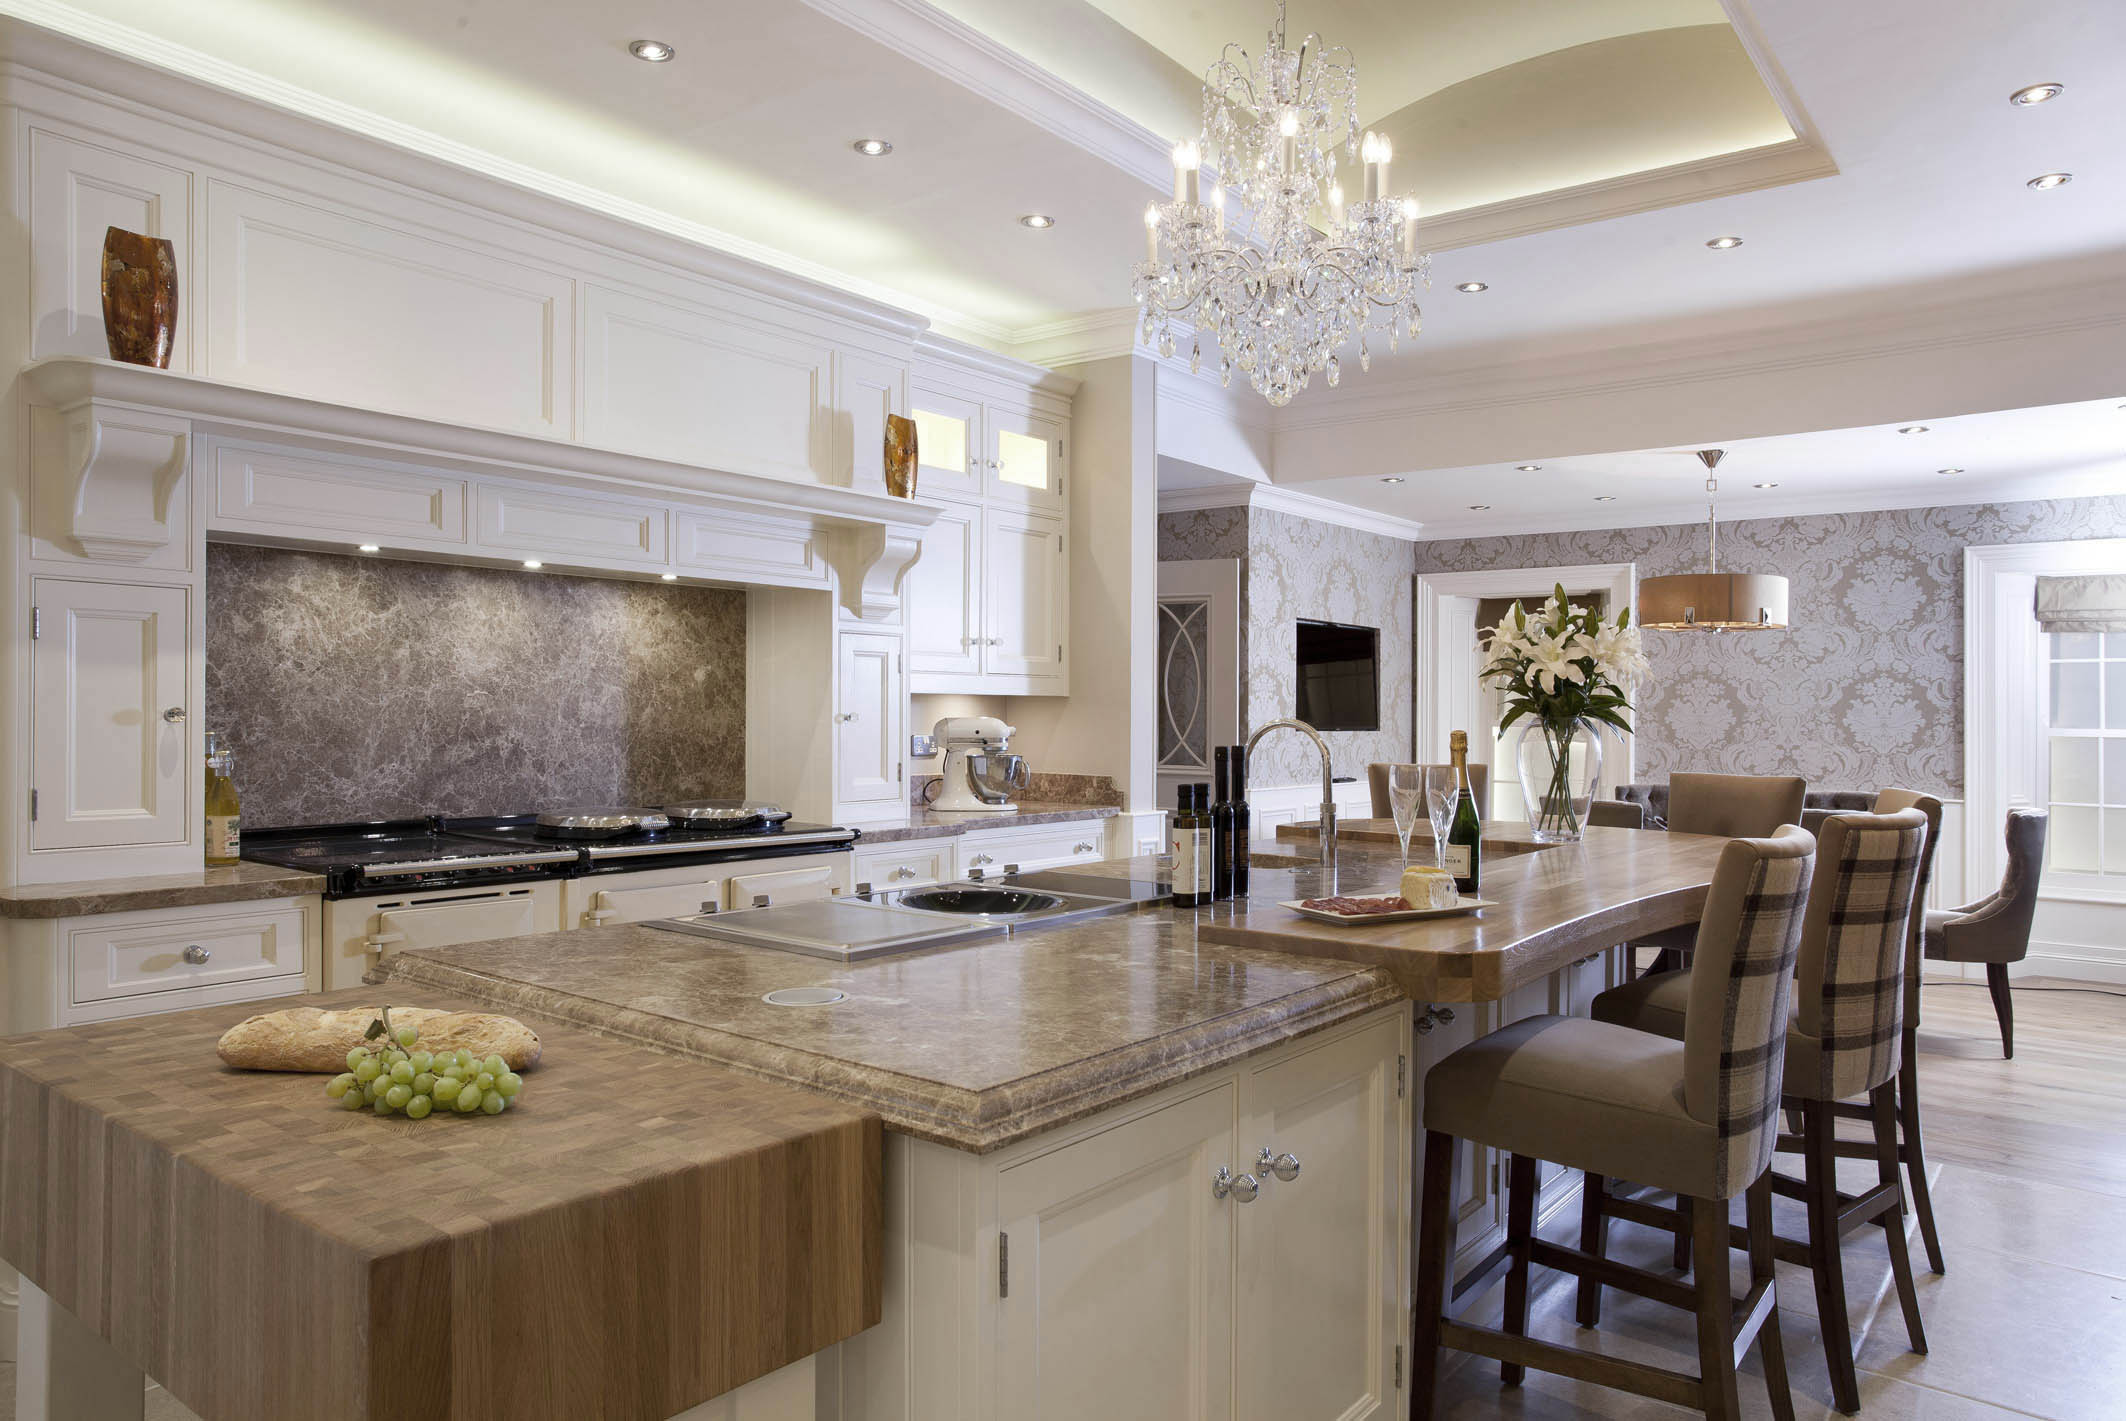 Bellingham Inframe Kitchen, Wicklow